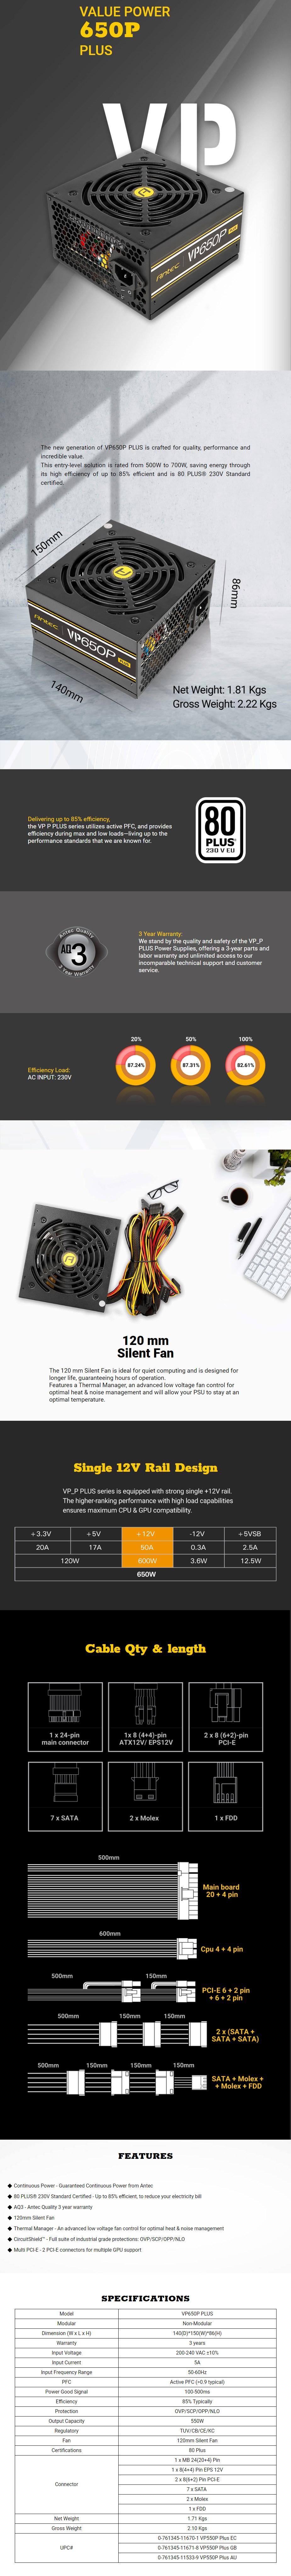 Antec VP650P PLUS 650W 80+ PSU 120mm Power Supply - Overview 1